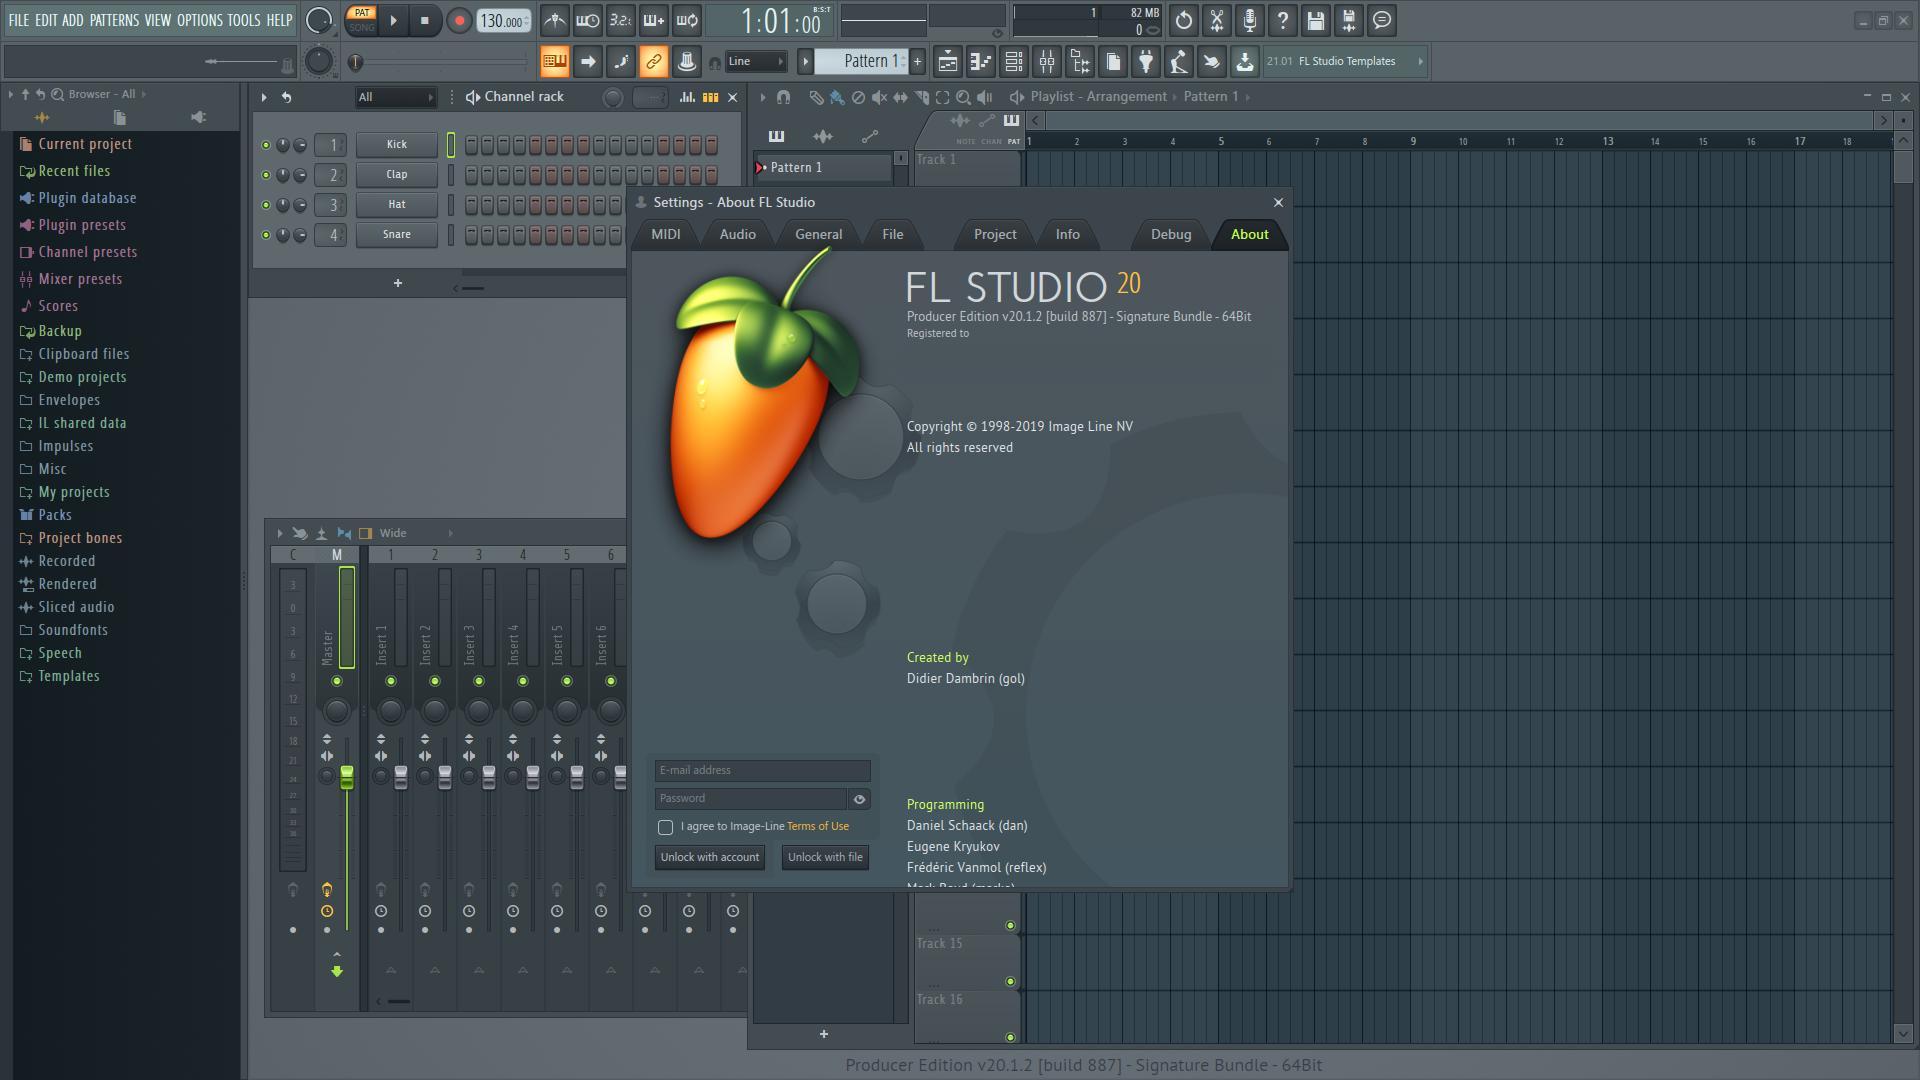 FL Studio Signature Bundle 32 bit and 64 bit - UPDATED - ONE CLICK  INSTALLATION - Lifetime No Expiration Send thru email download